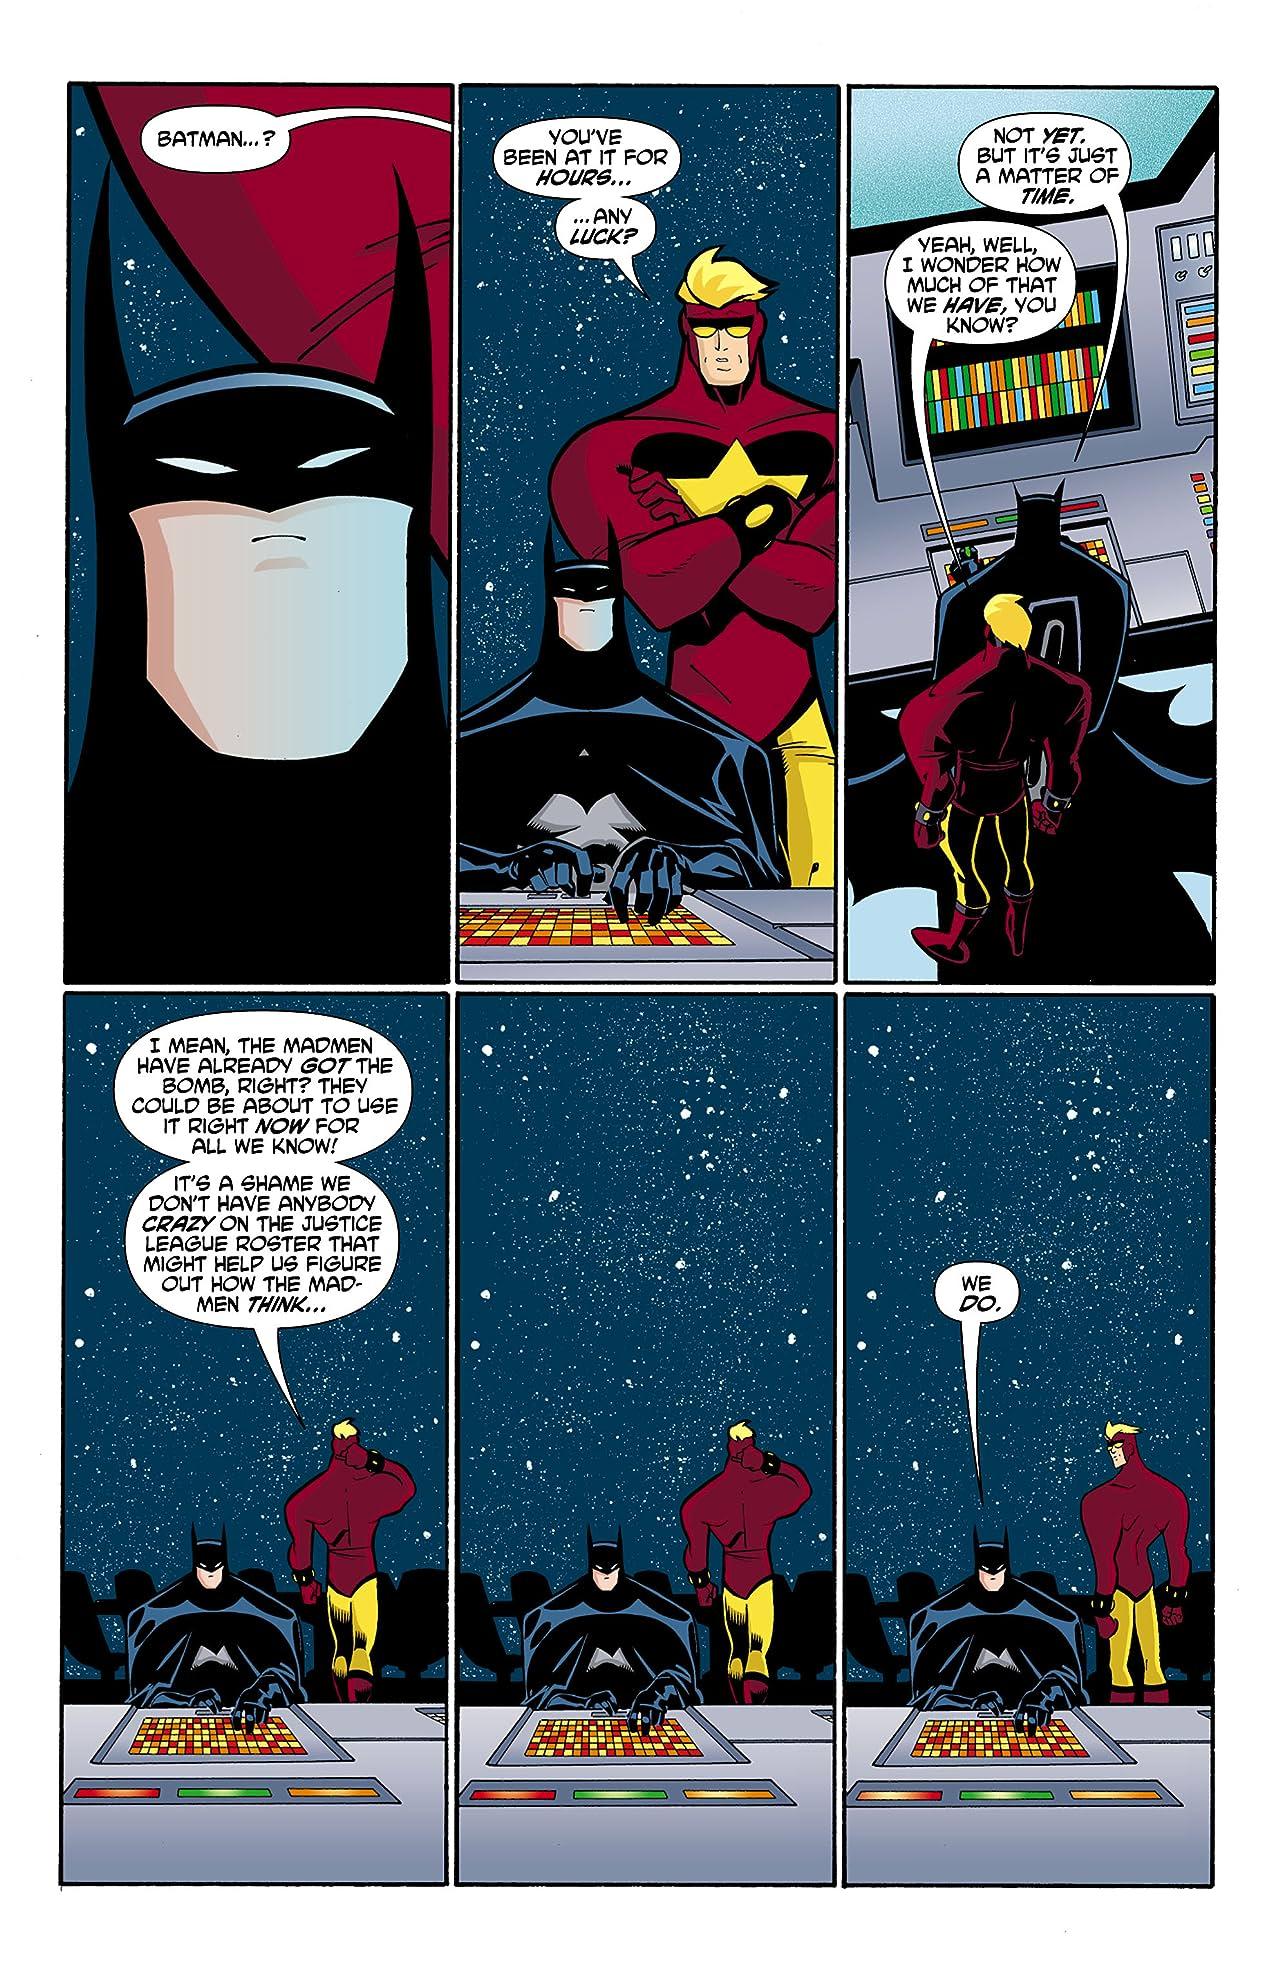 Justice League Unlimited #10